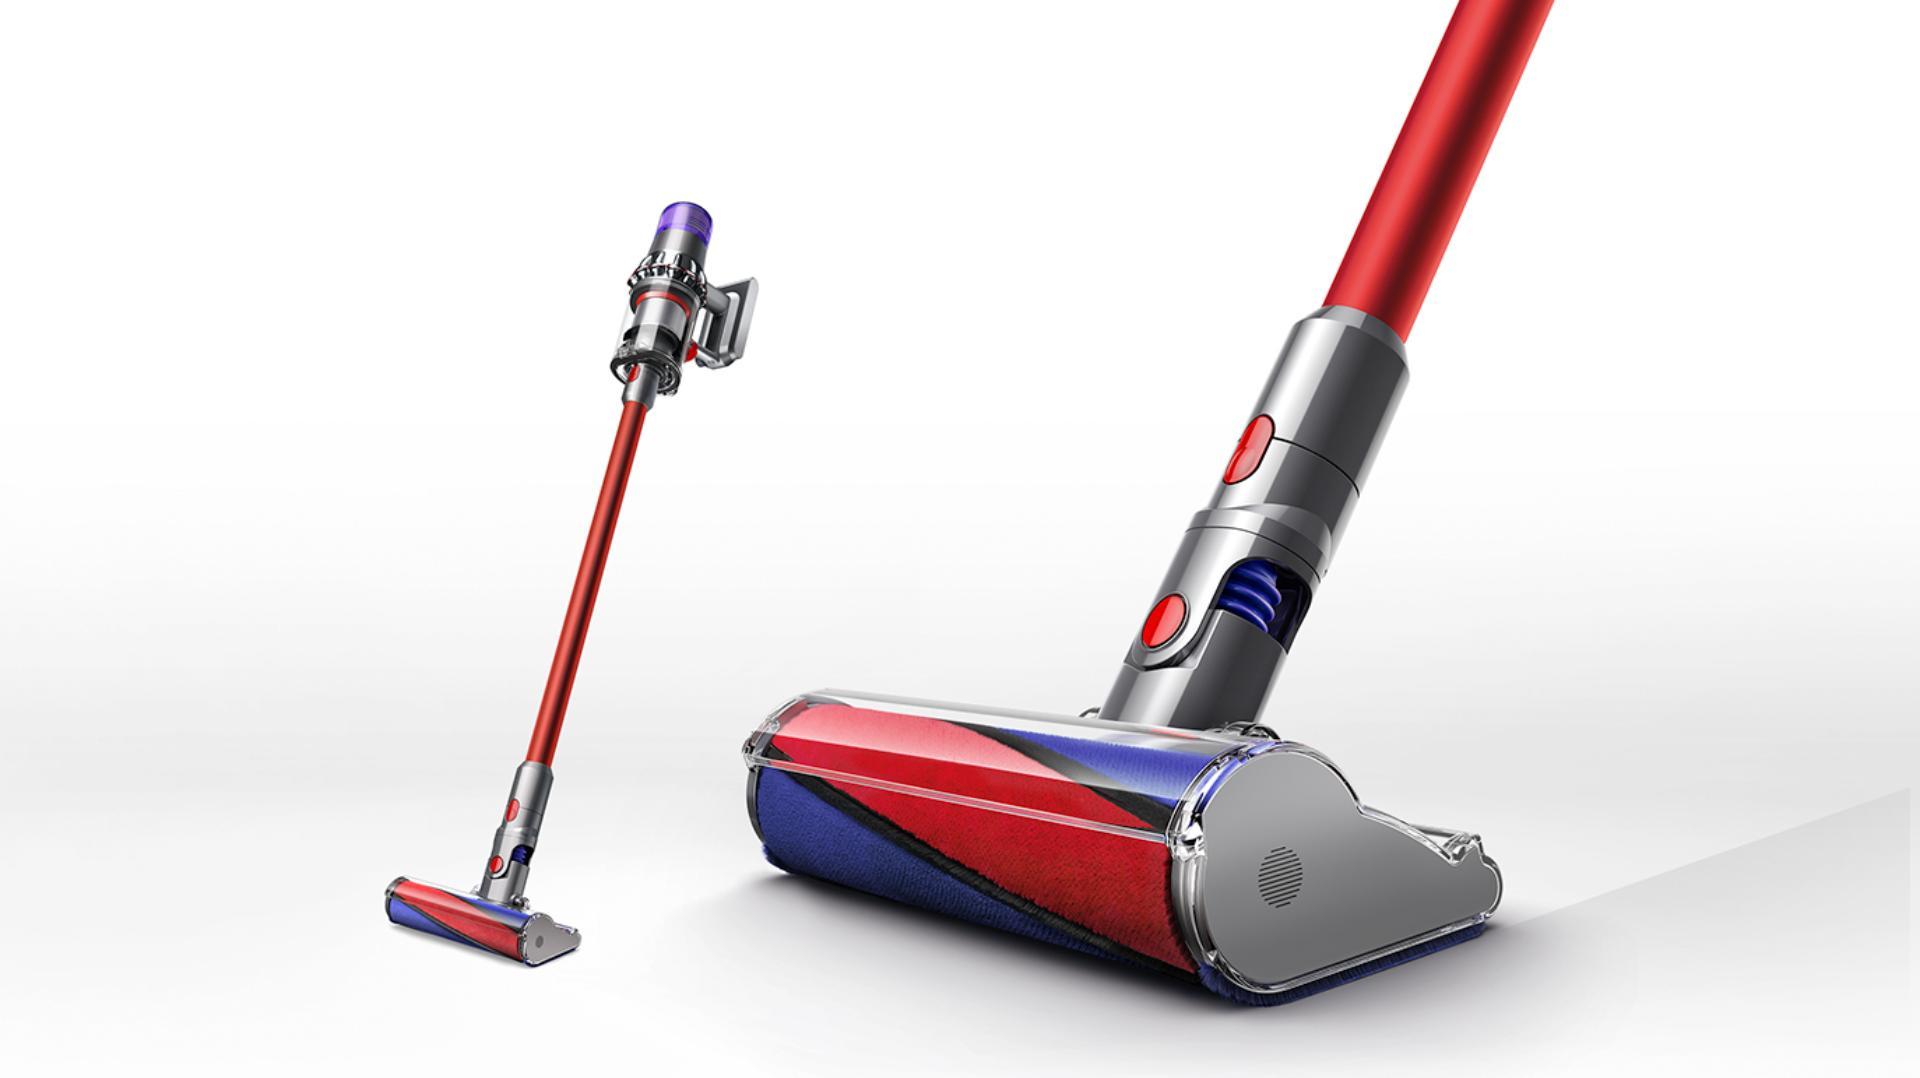 CNY cordless vacuum